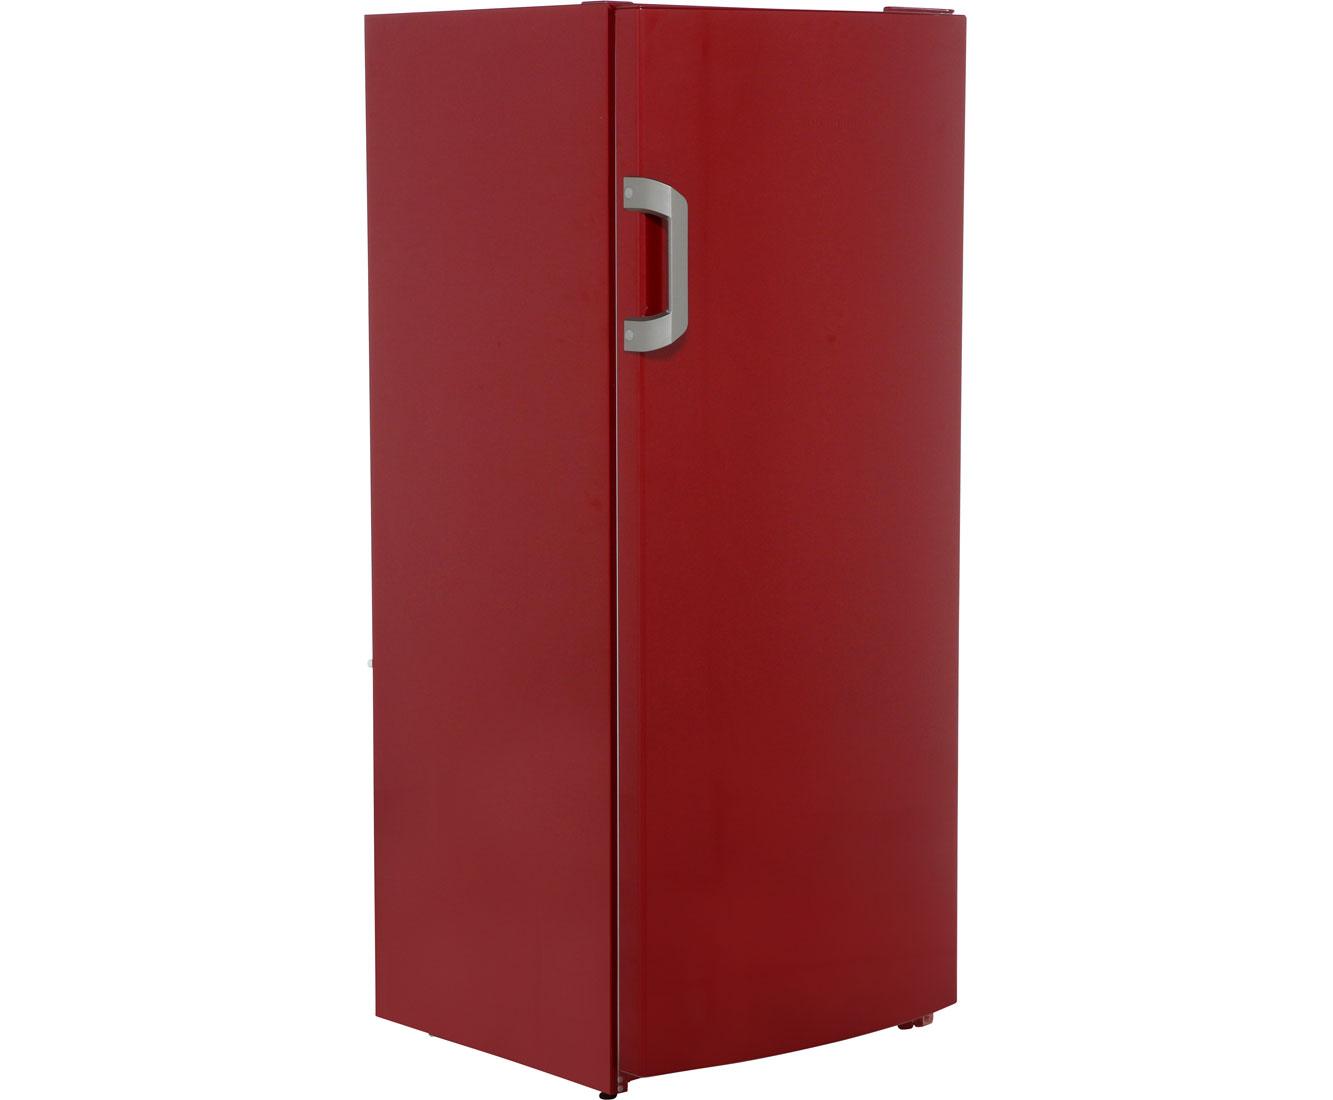 Retro Kühlschrank Rot Gorenje : Gorenje orb rd cm rot retro kühlschrank mit gefrierfach box